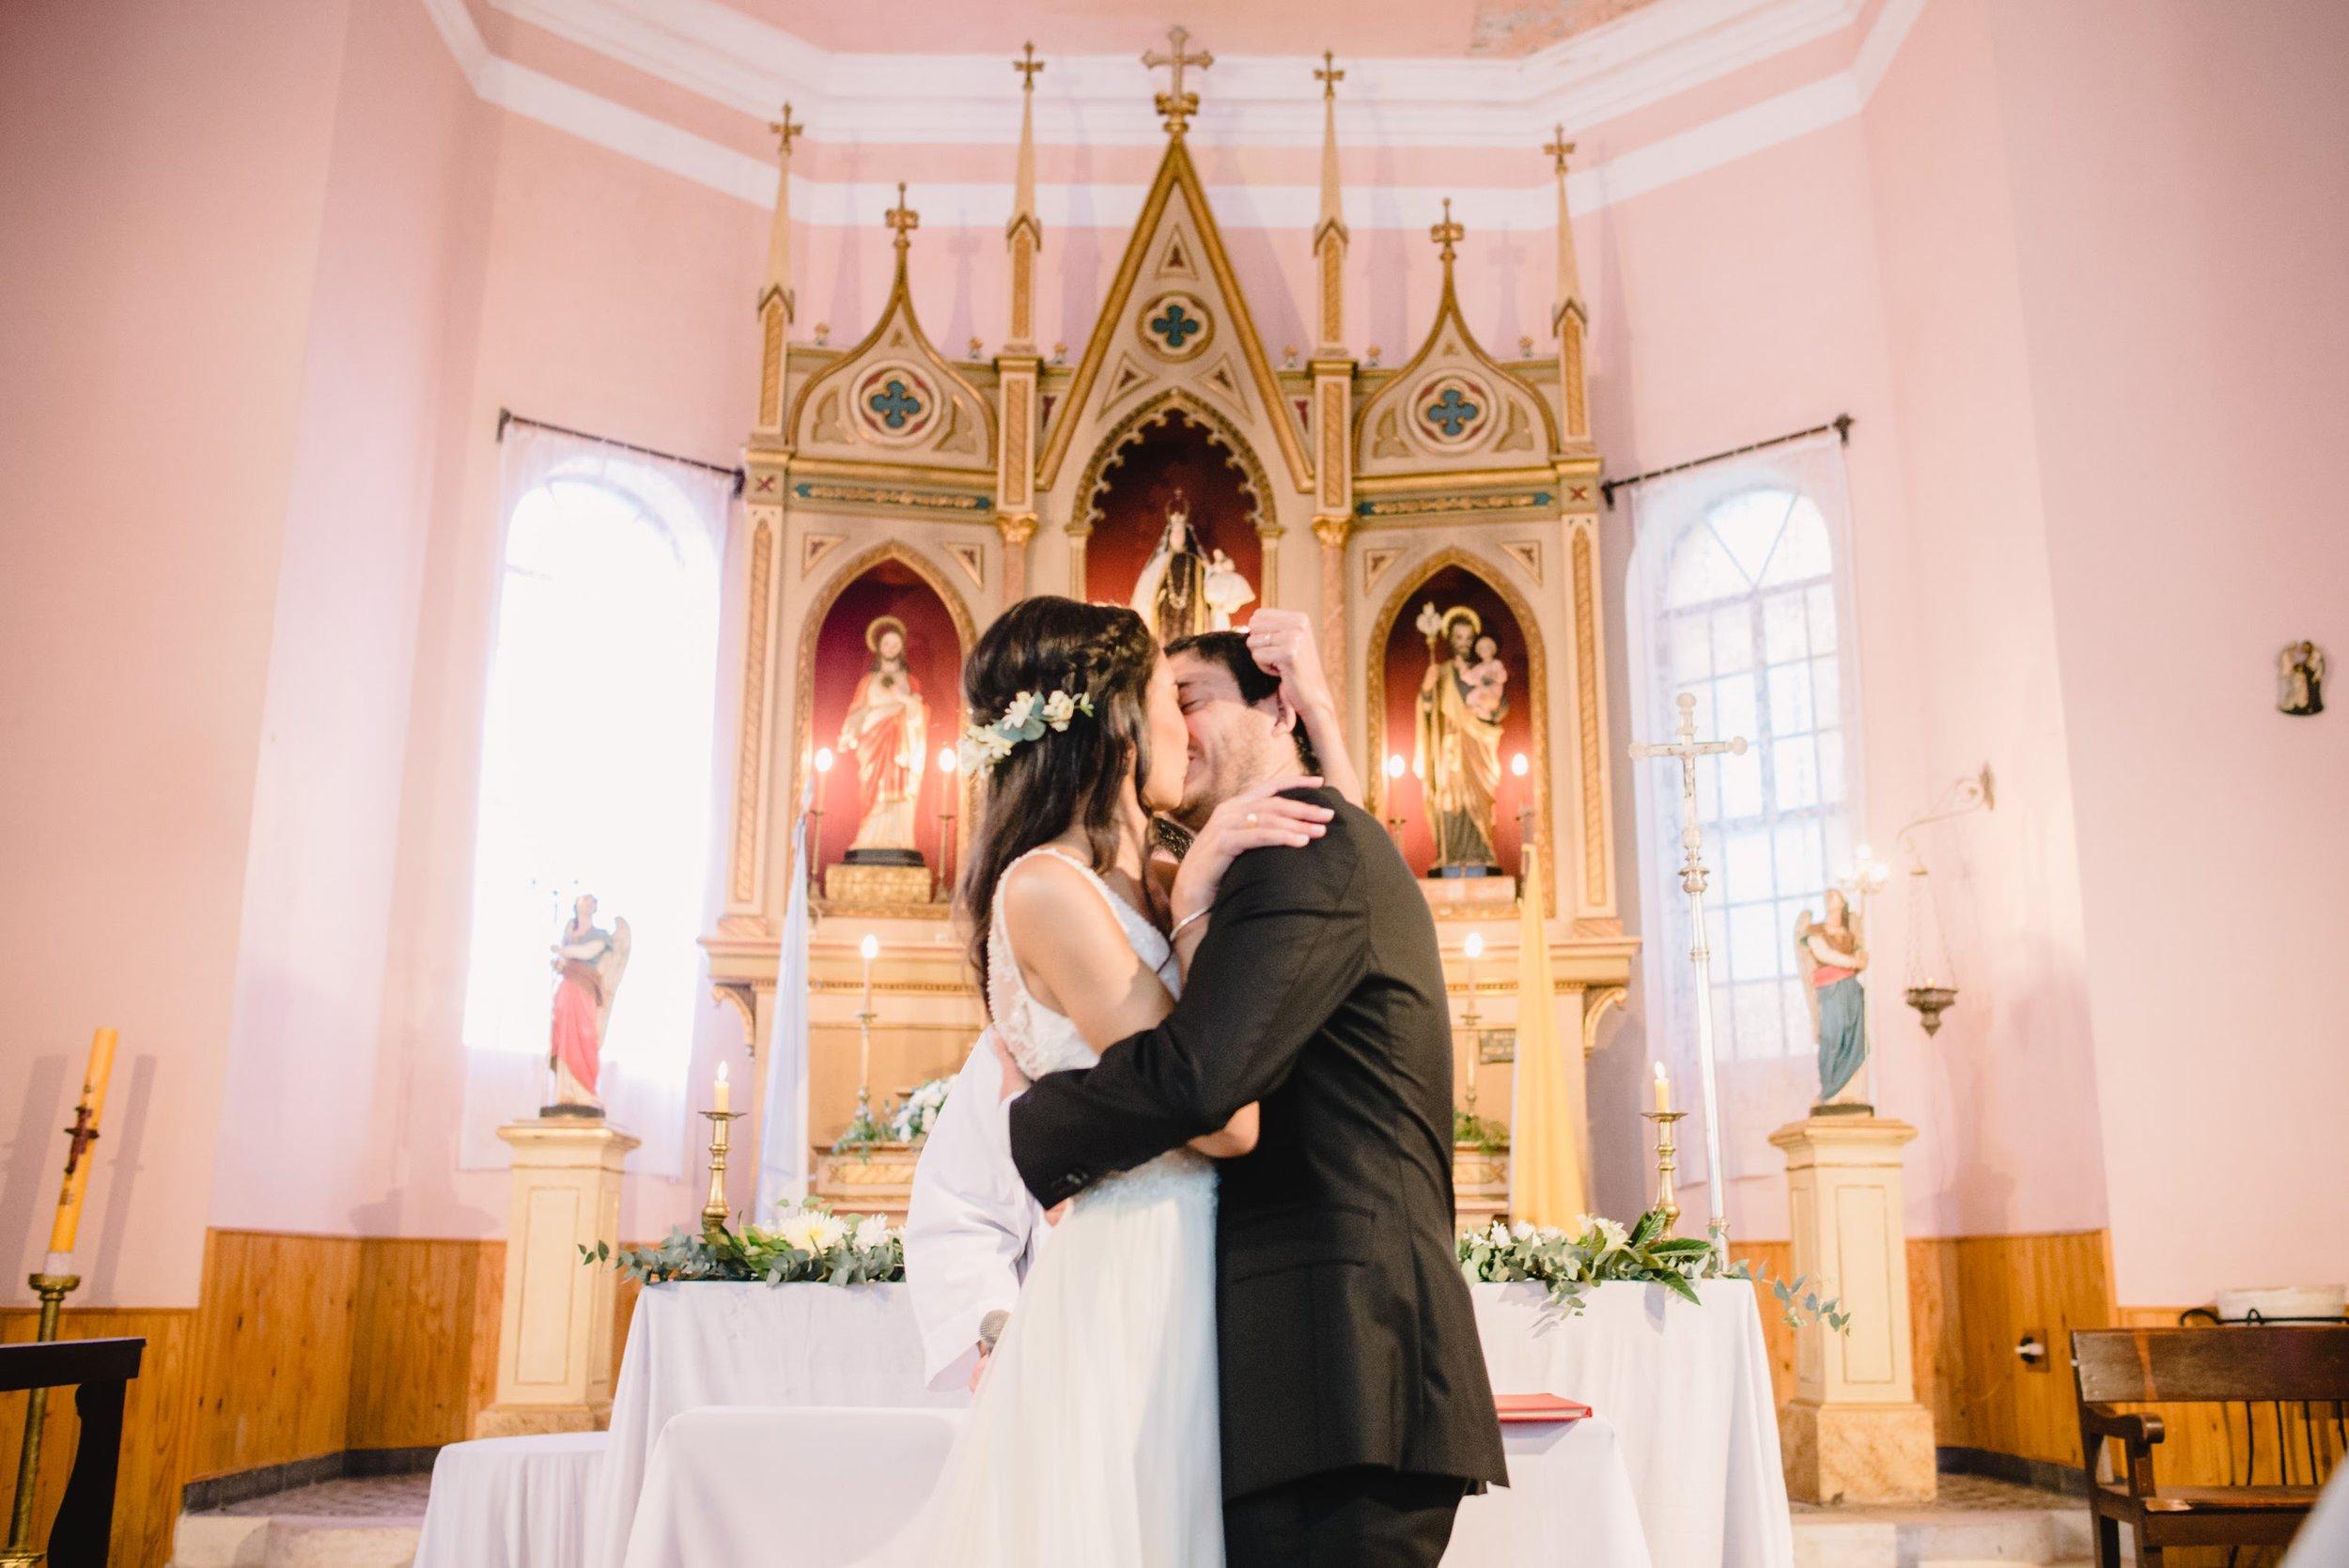 fotografo de bodas en carlos paz cordoba 028.JPG